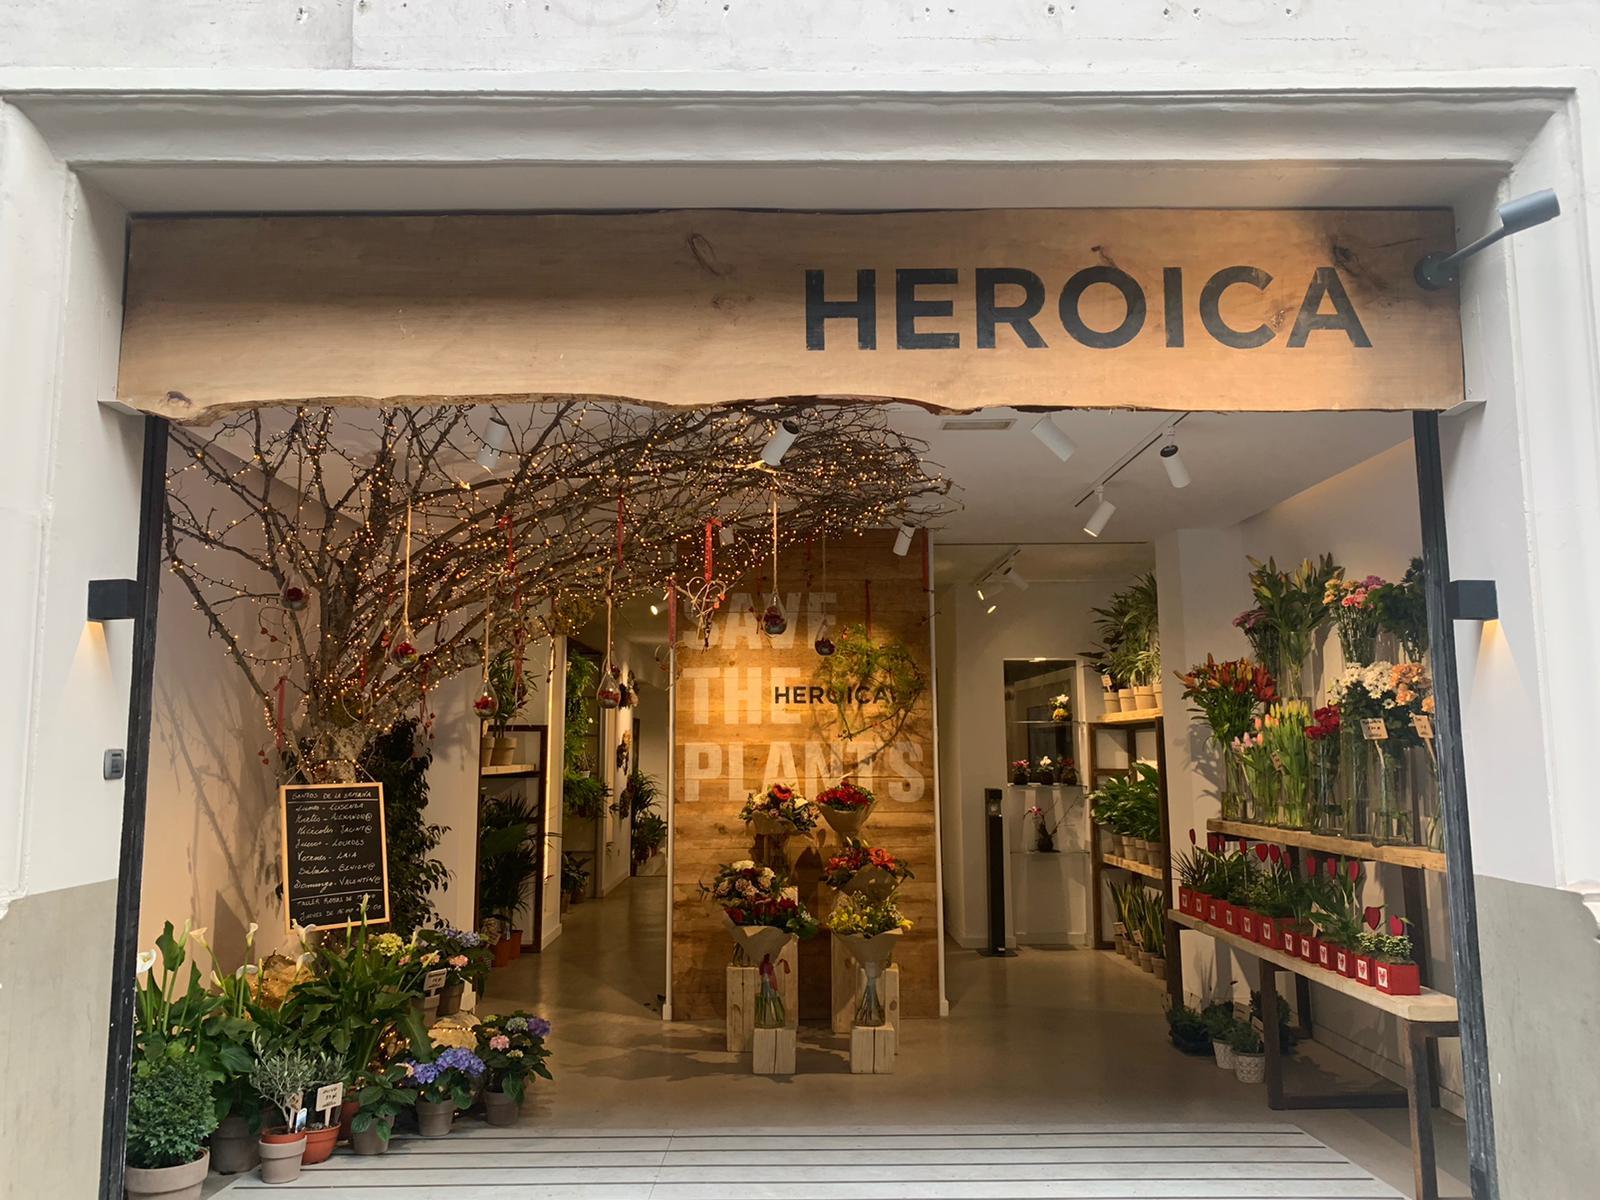 Tienda Heroica